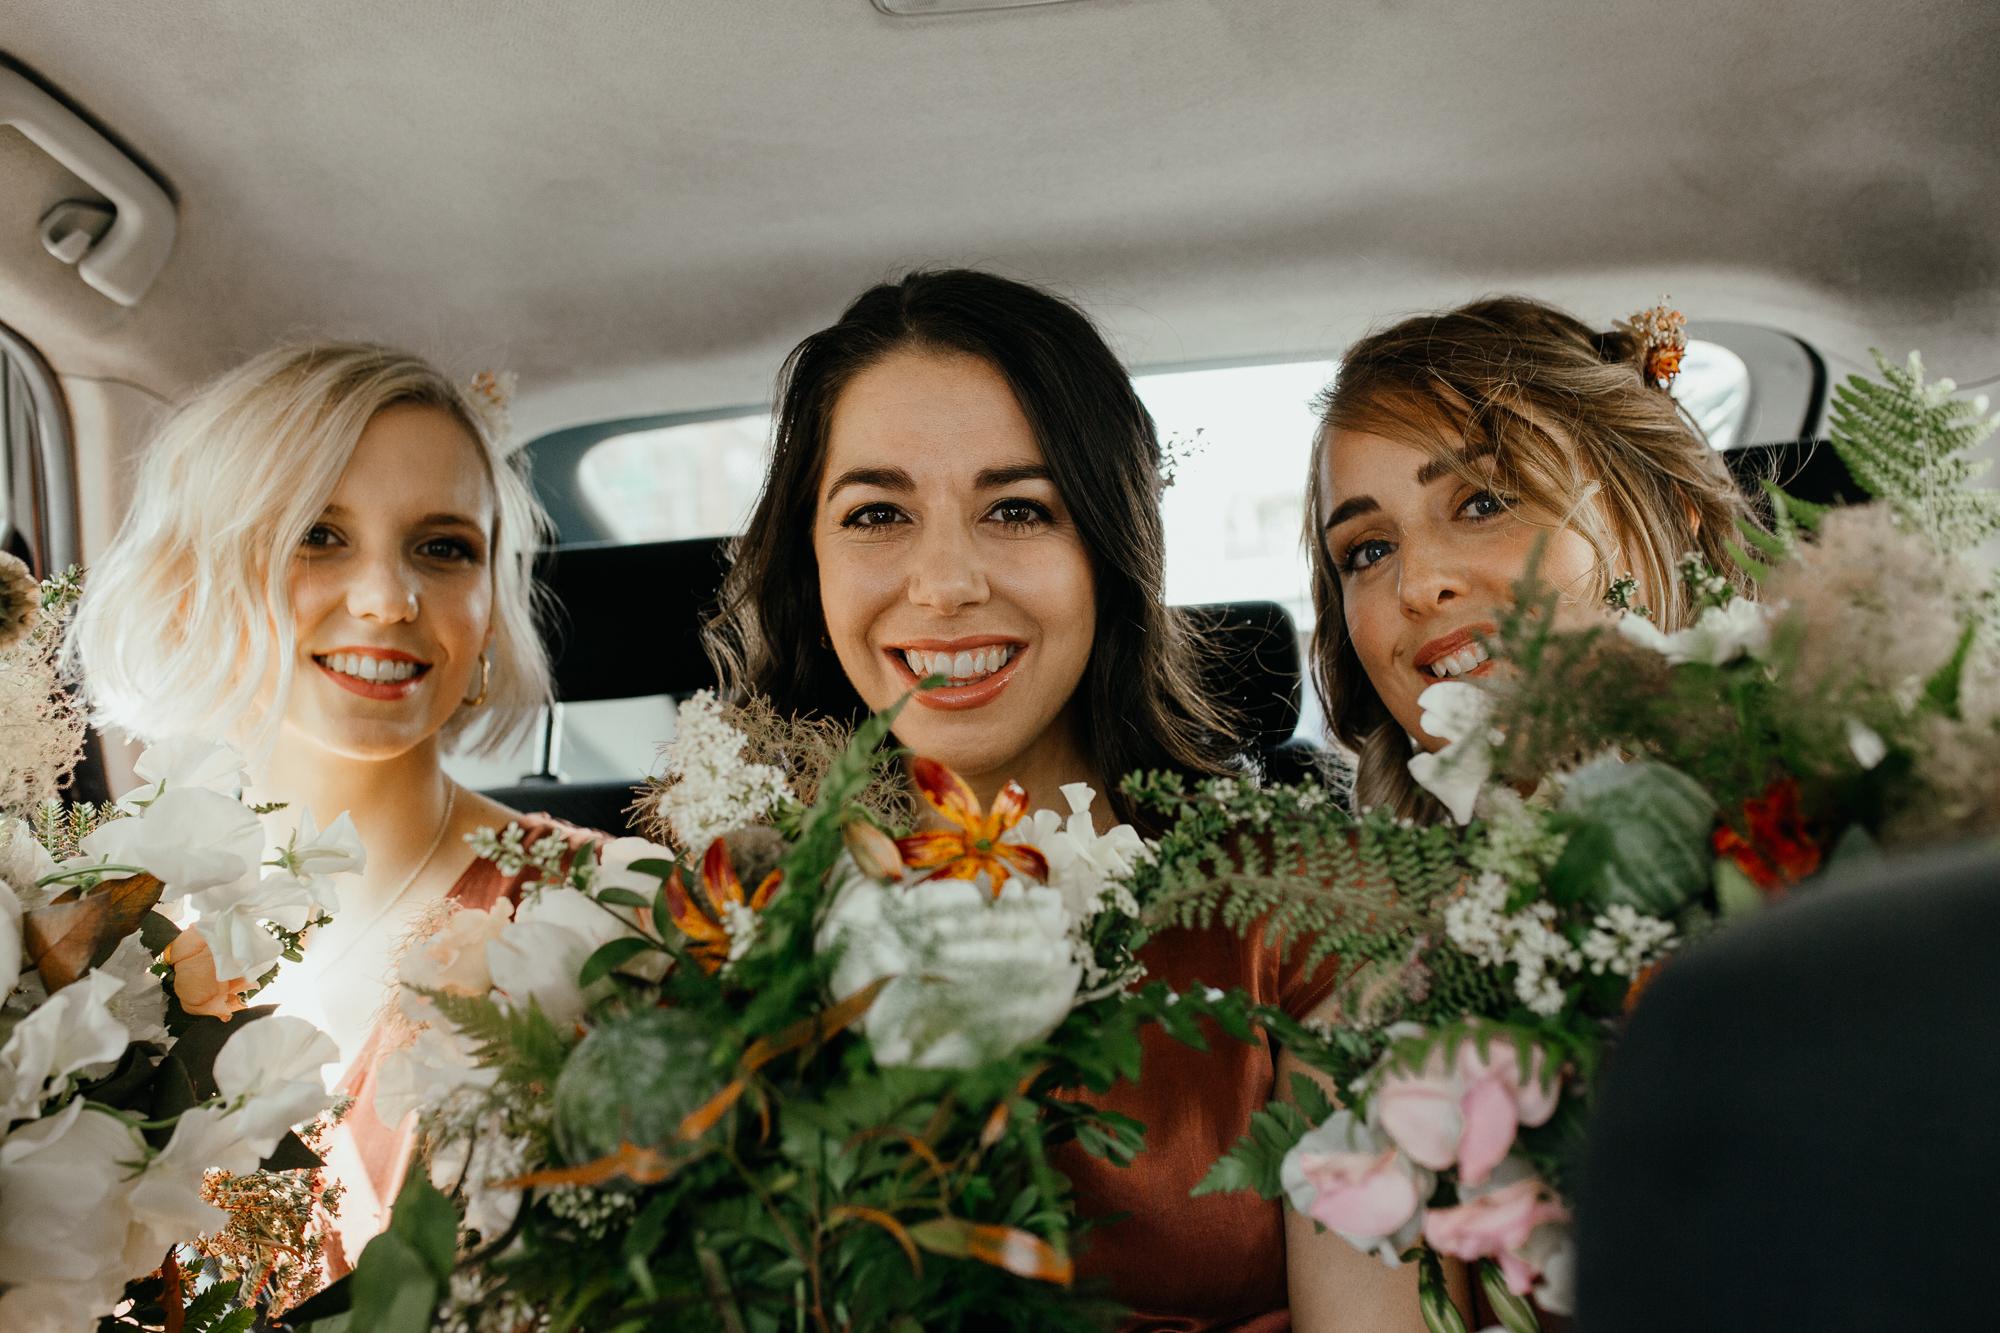 stephanie-green-wedding-photography-sulaflowers-sula-flowers-london-islington-town-hall-depot-n7-57.jpg